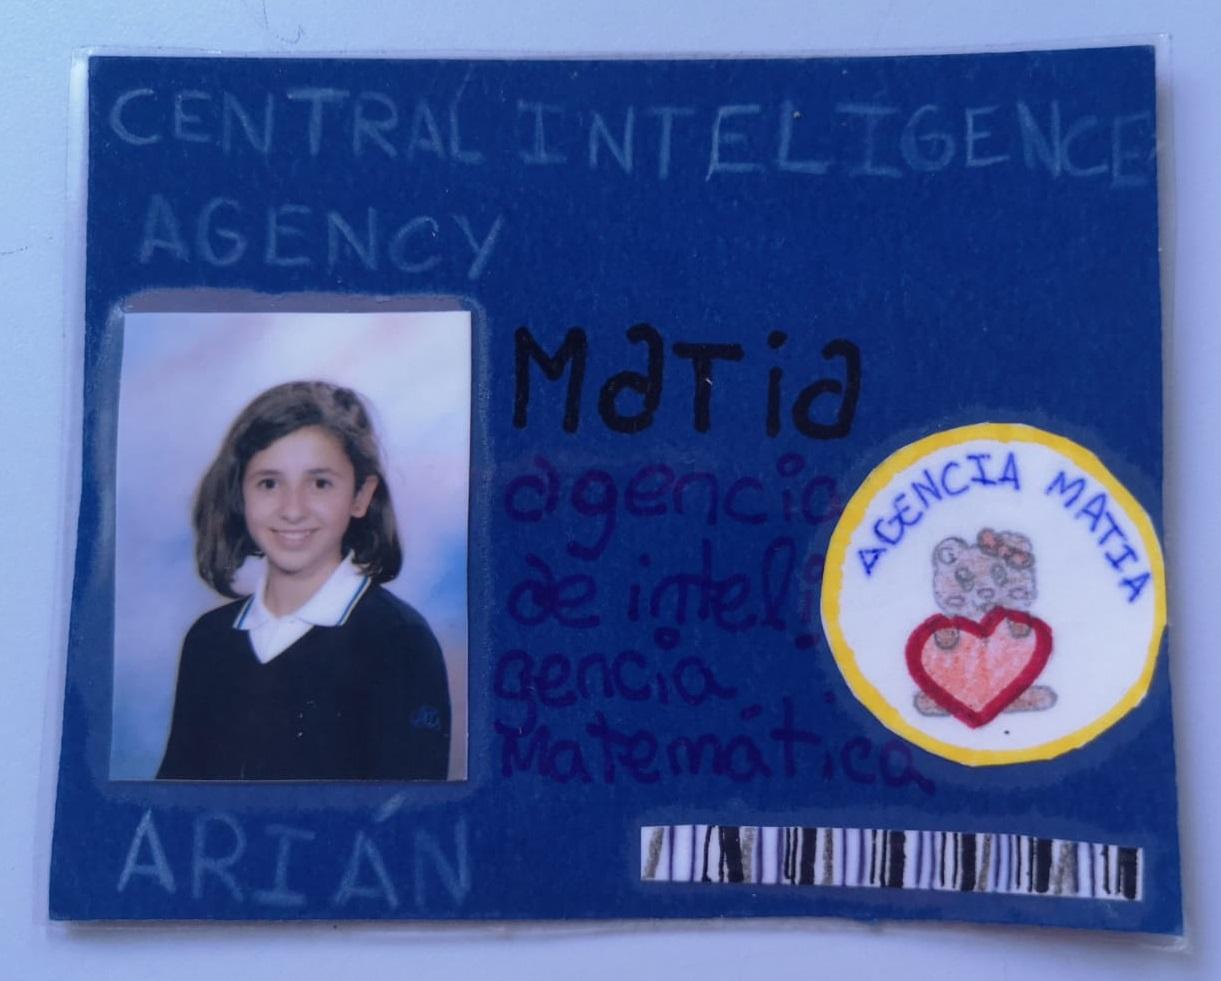 Carnet de Superagente MATIA